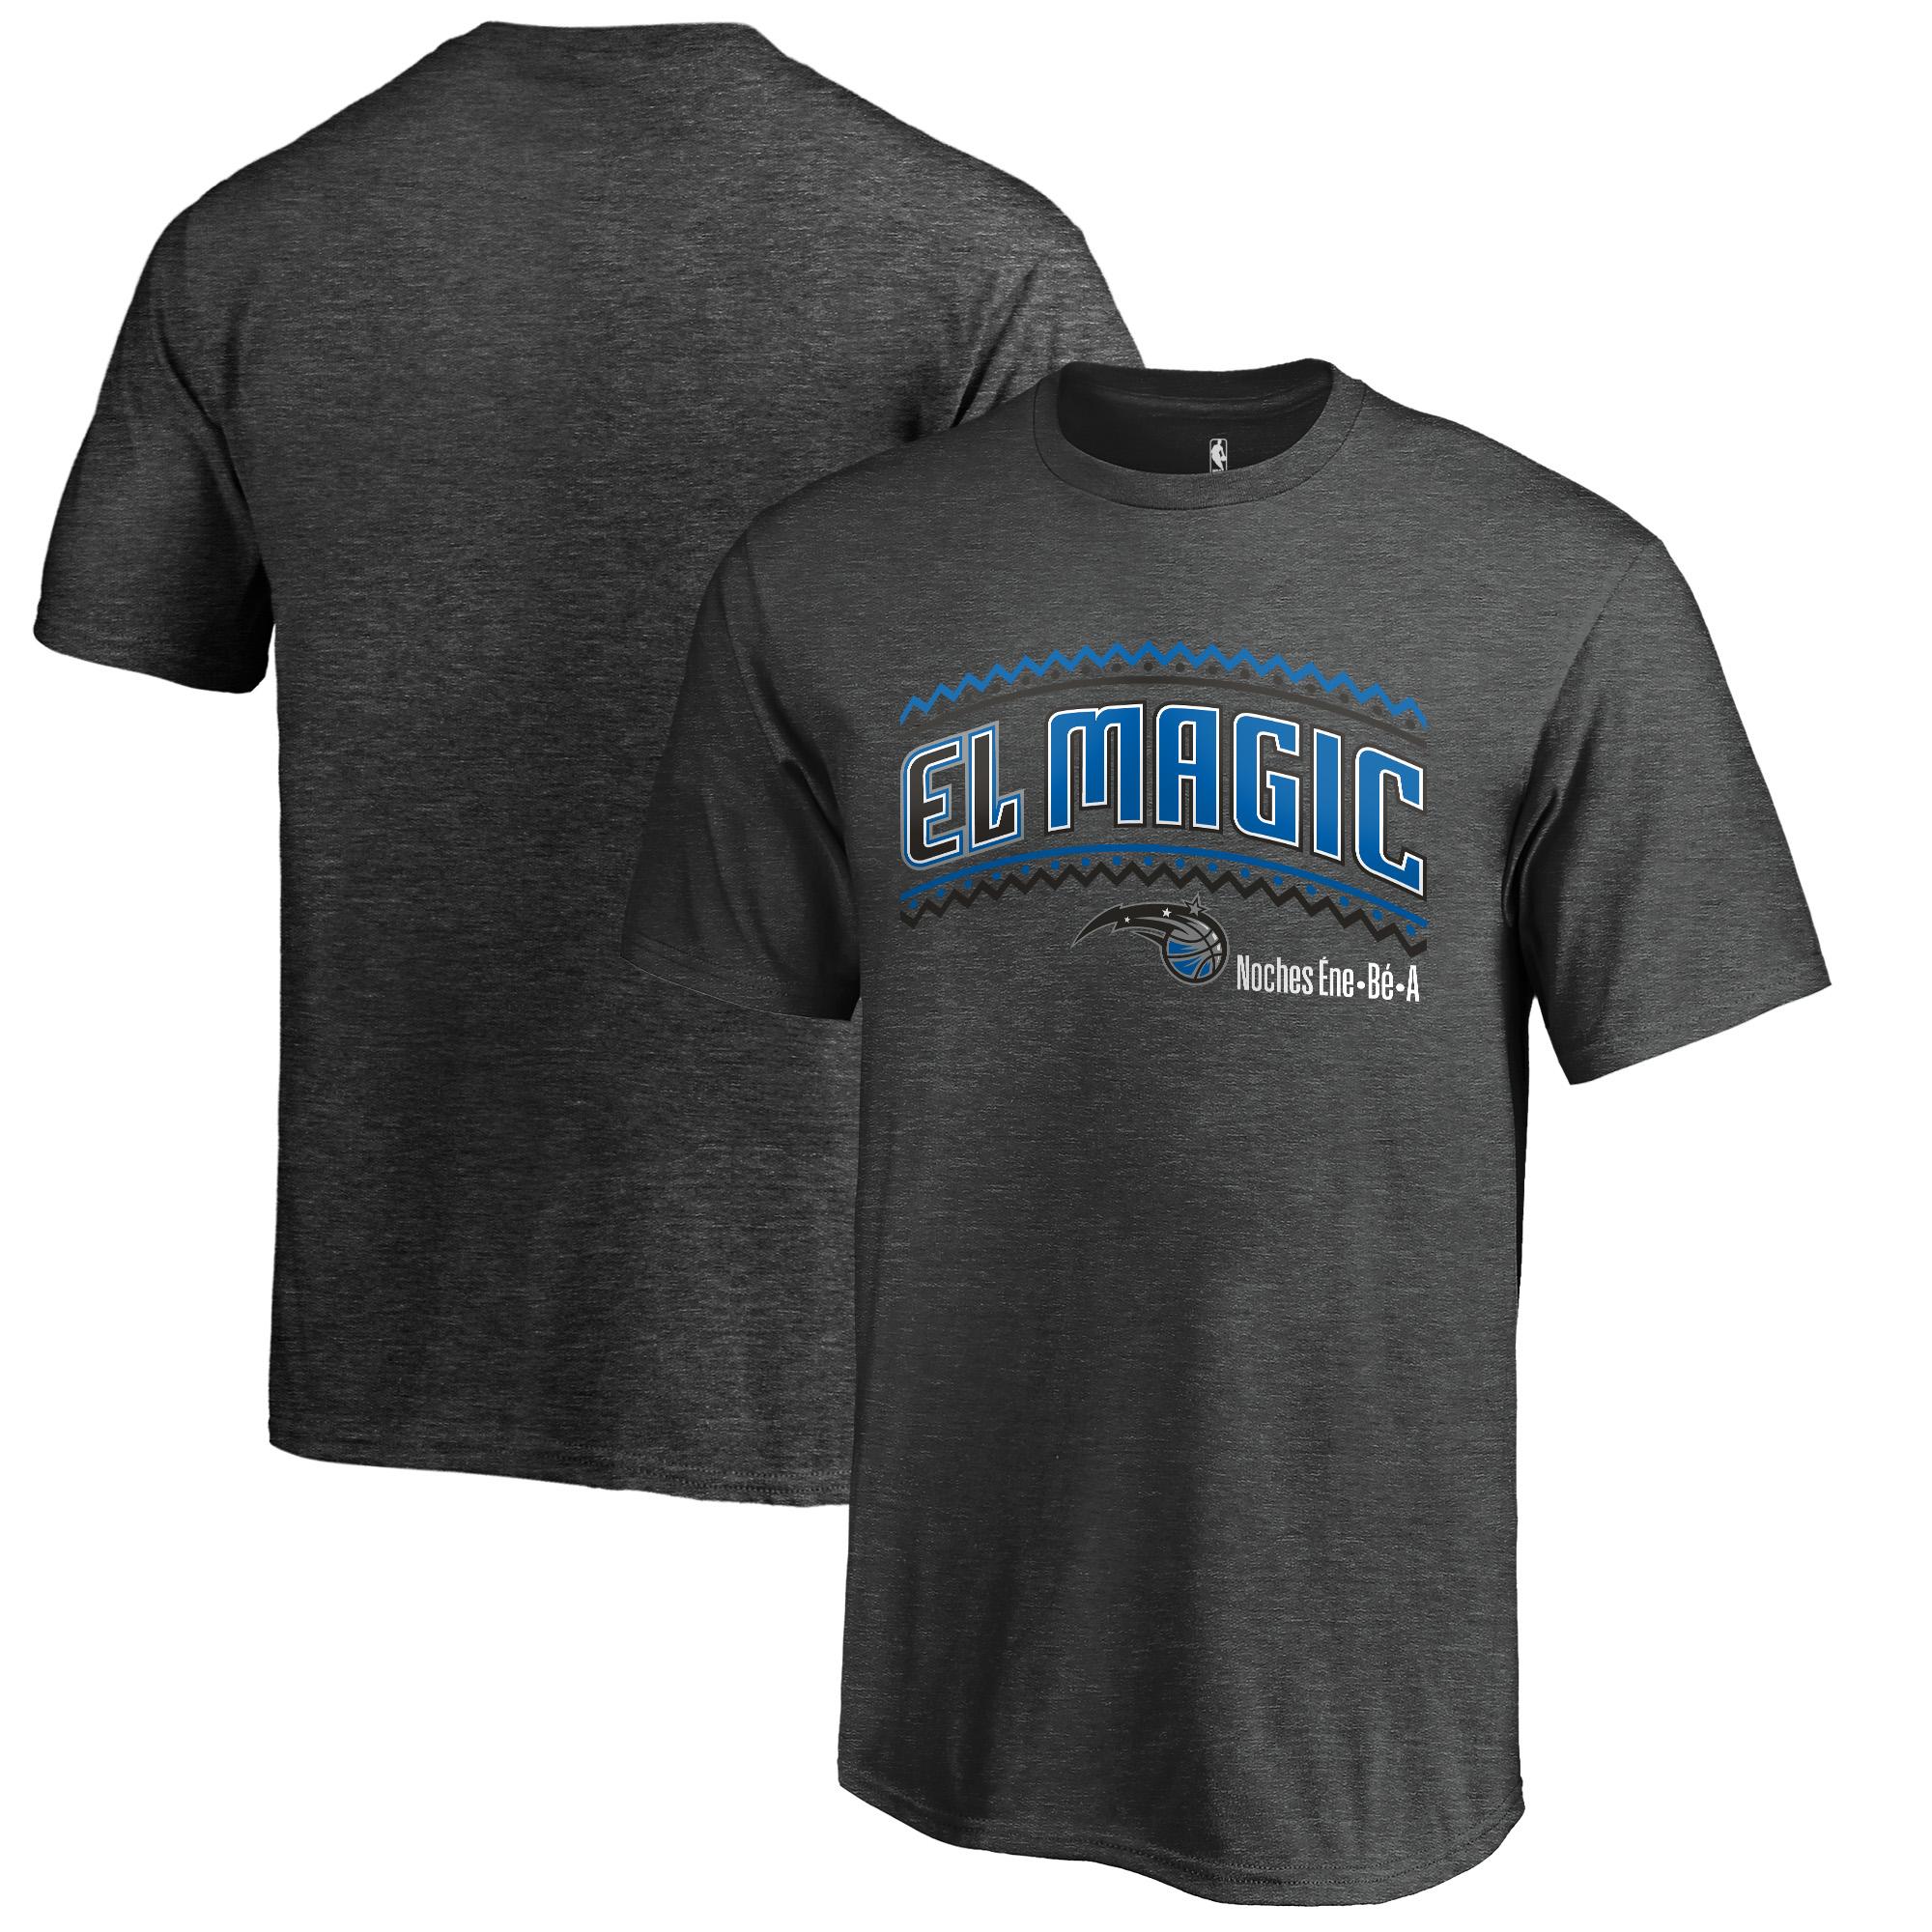 Orlando Magic Fanatics Branded Youth Noches Ene-Be-A T-Shirt - Heather Gray